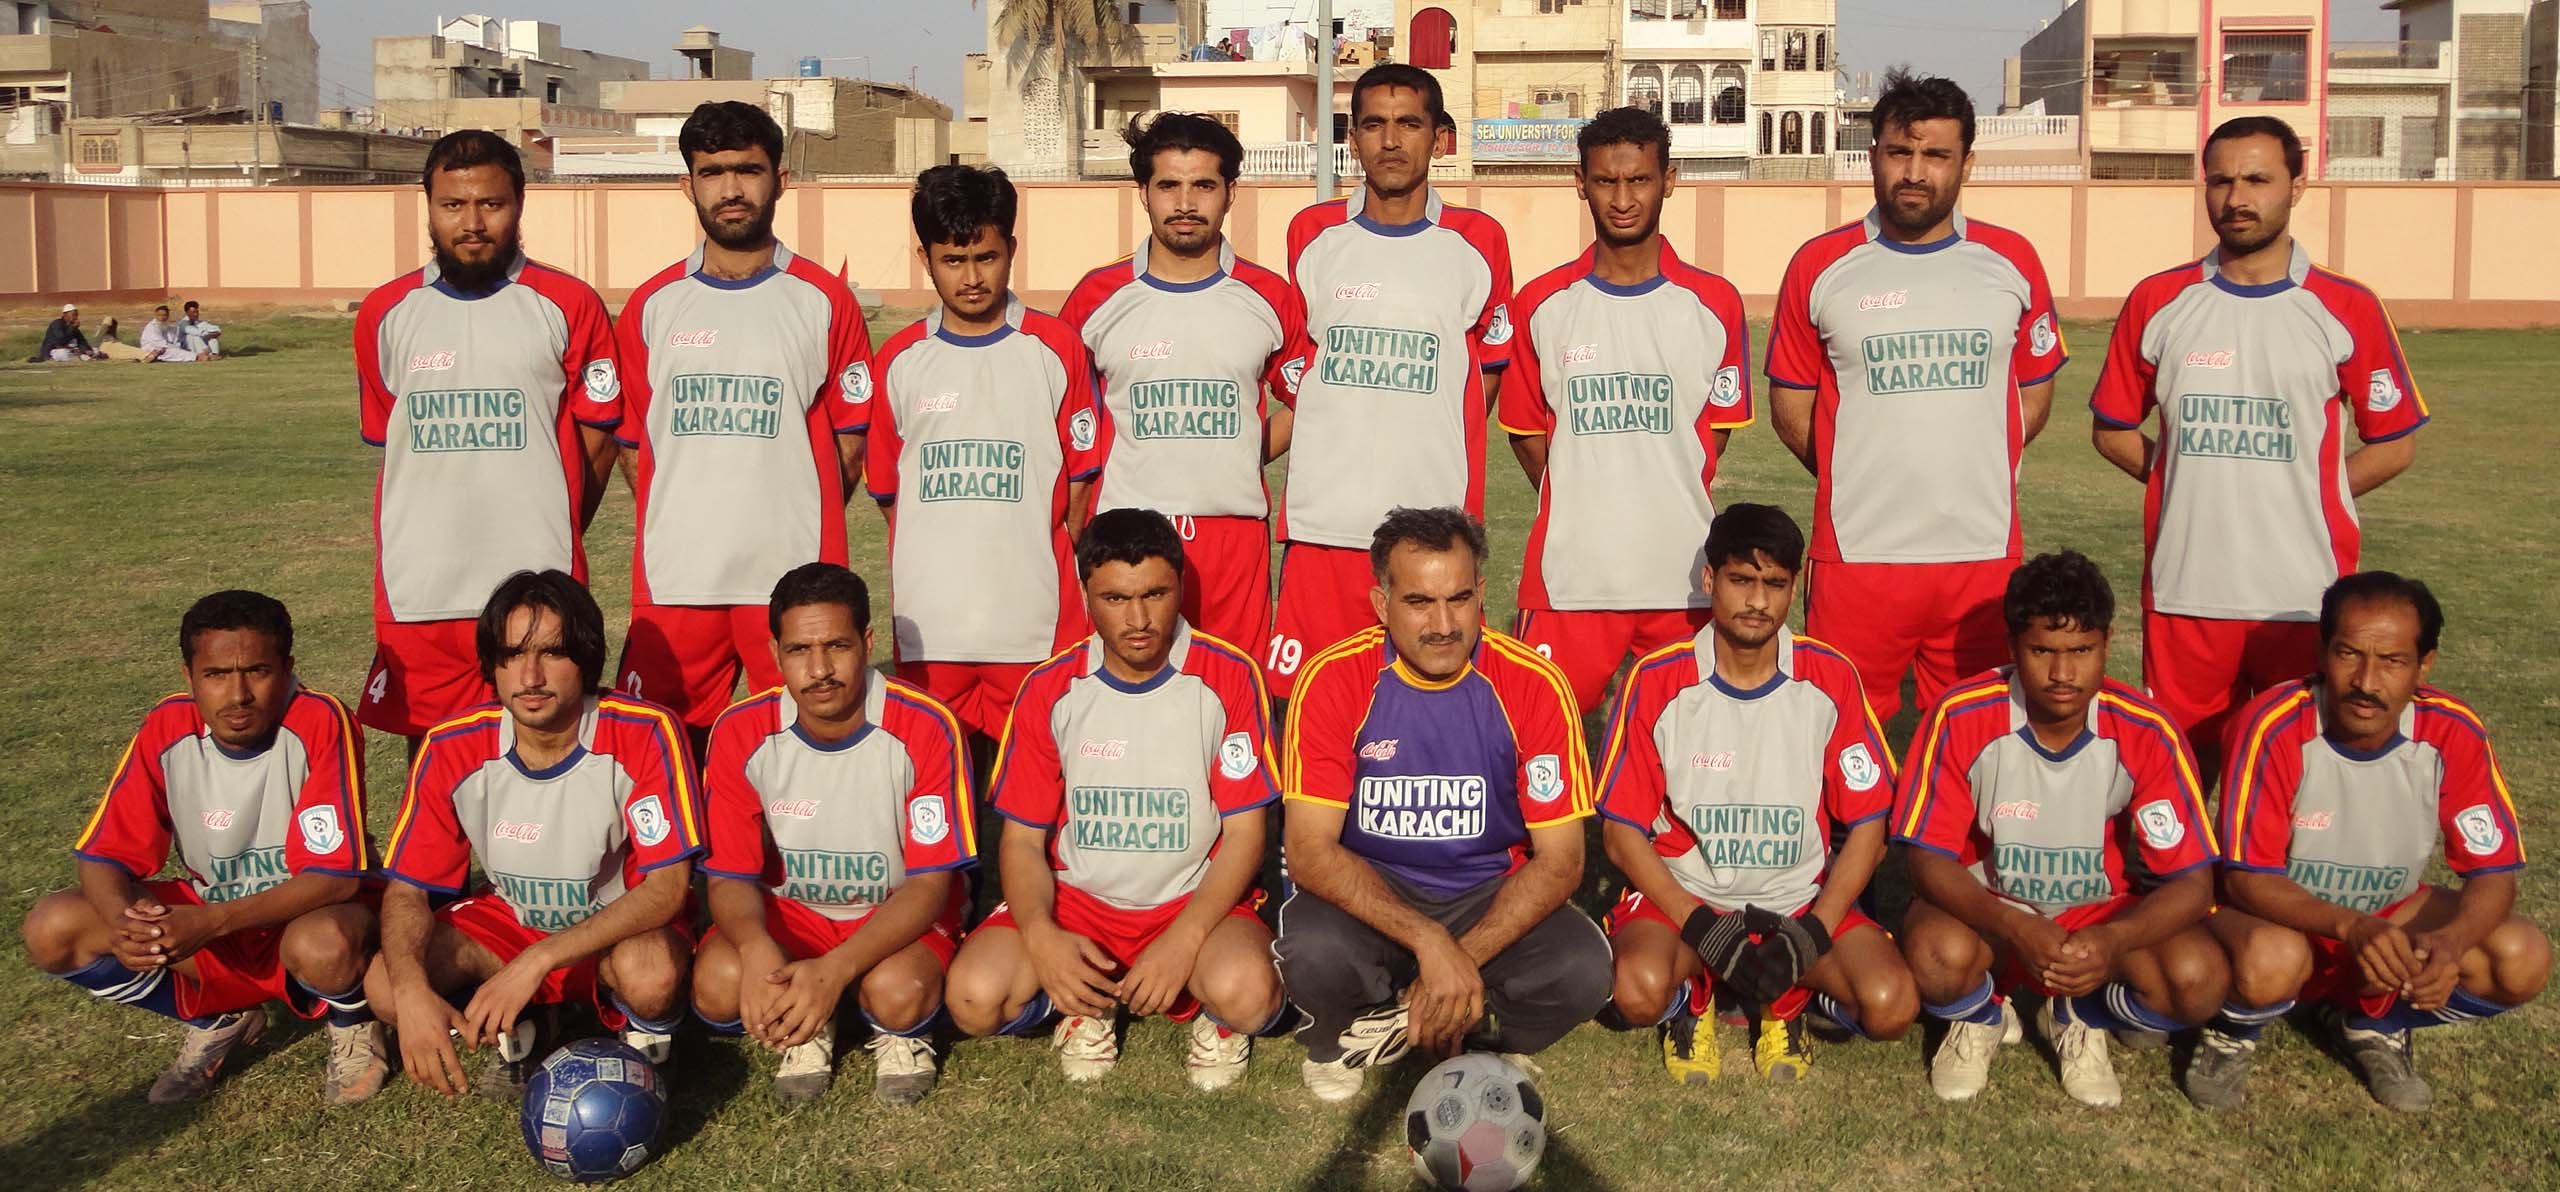 District East Football Championship: Korangi Red, Rahim Mohammedan, Jhoolay Lal and Nabi Baksh grab wins